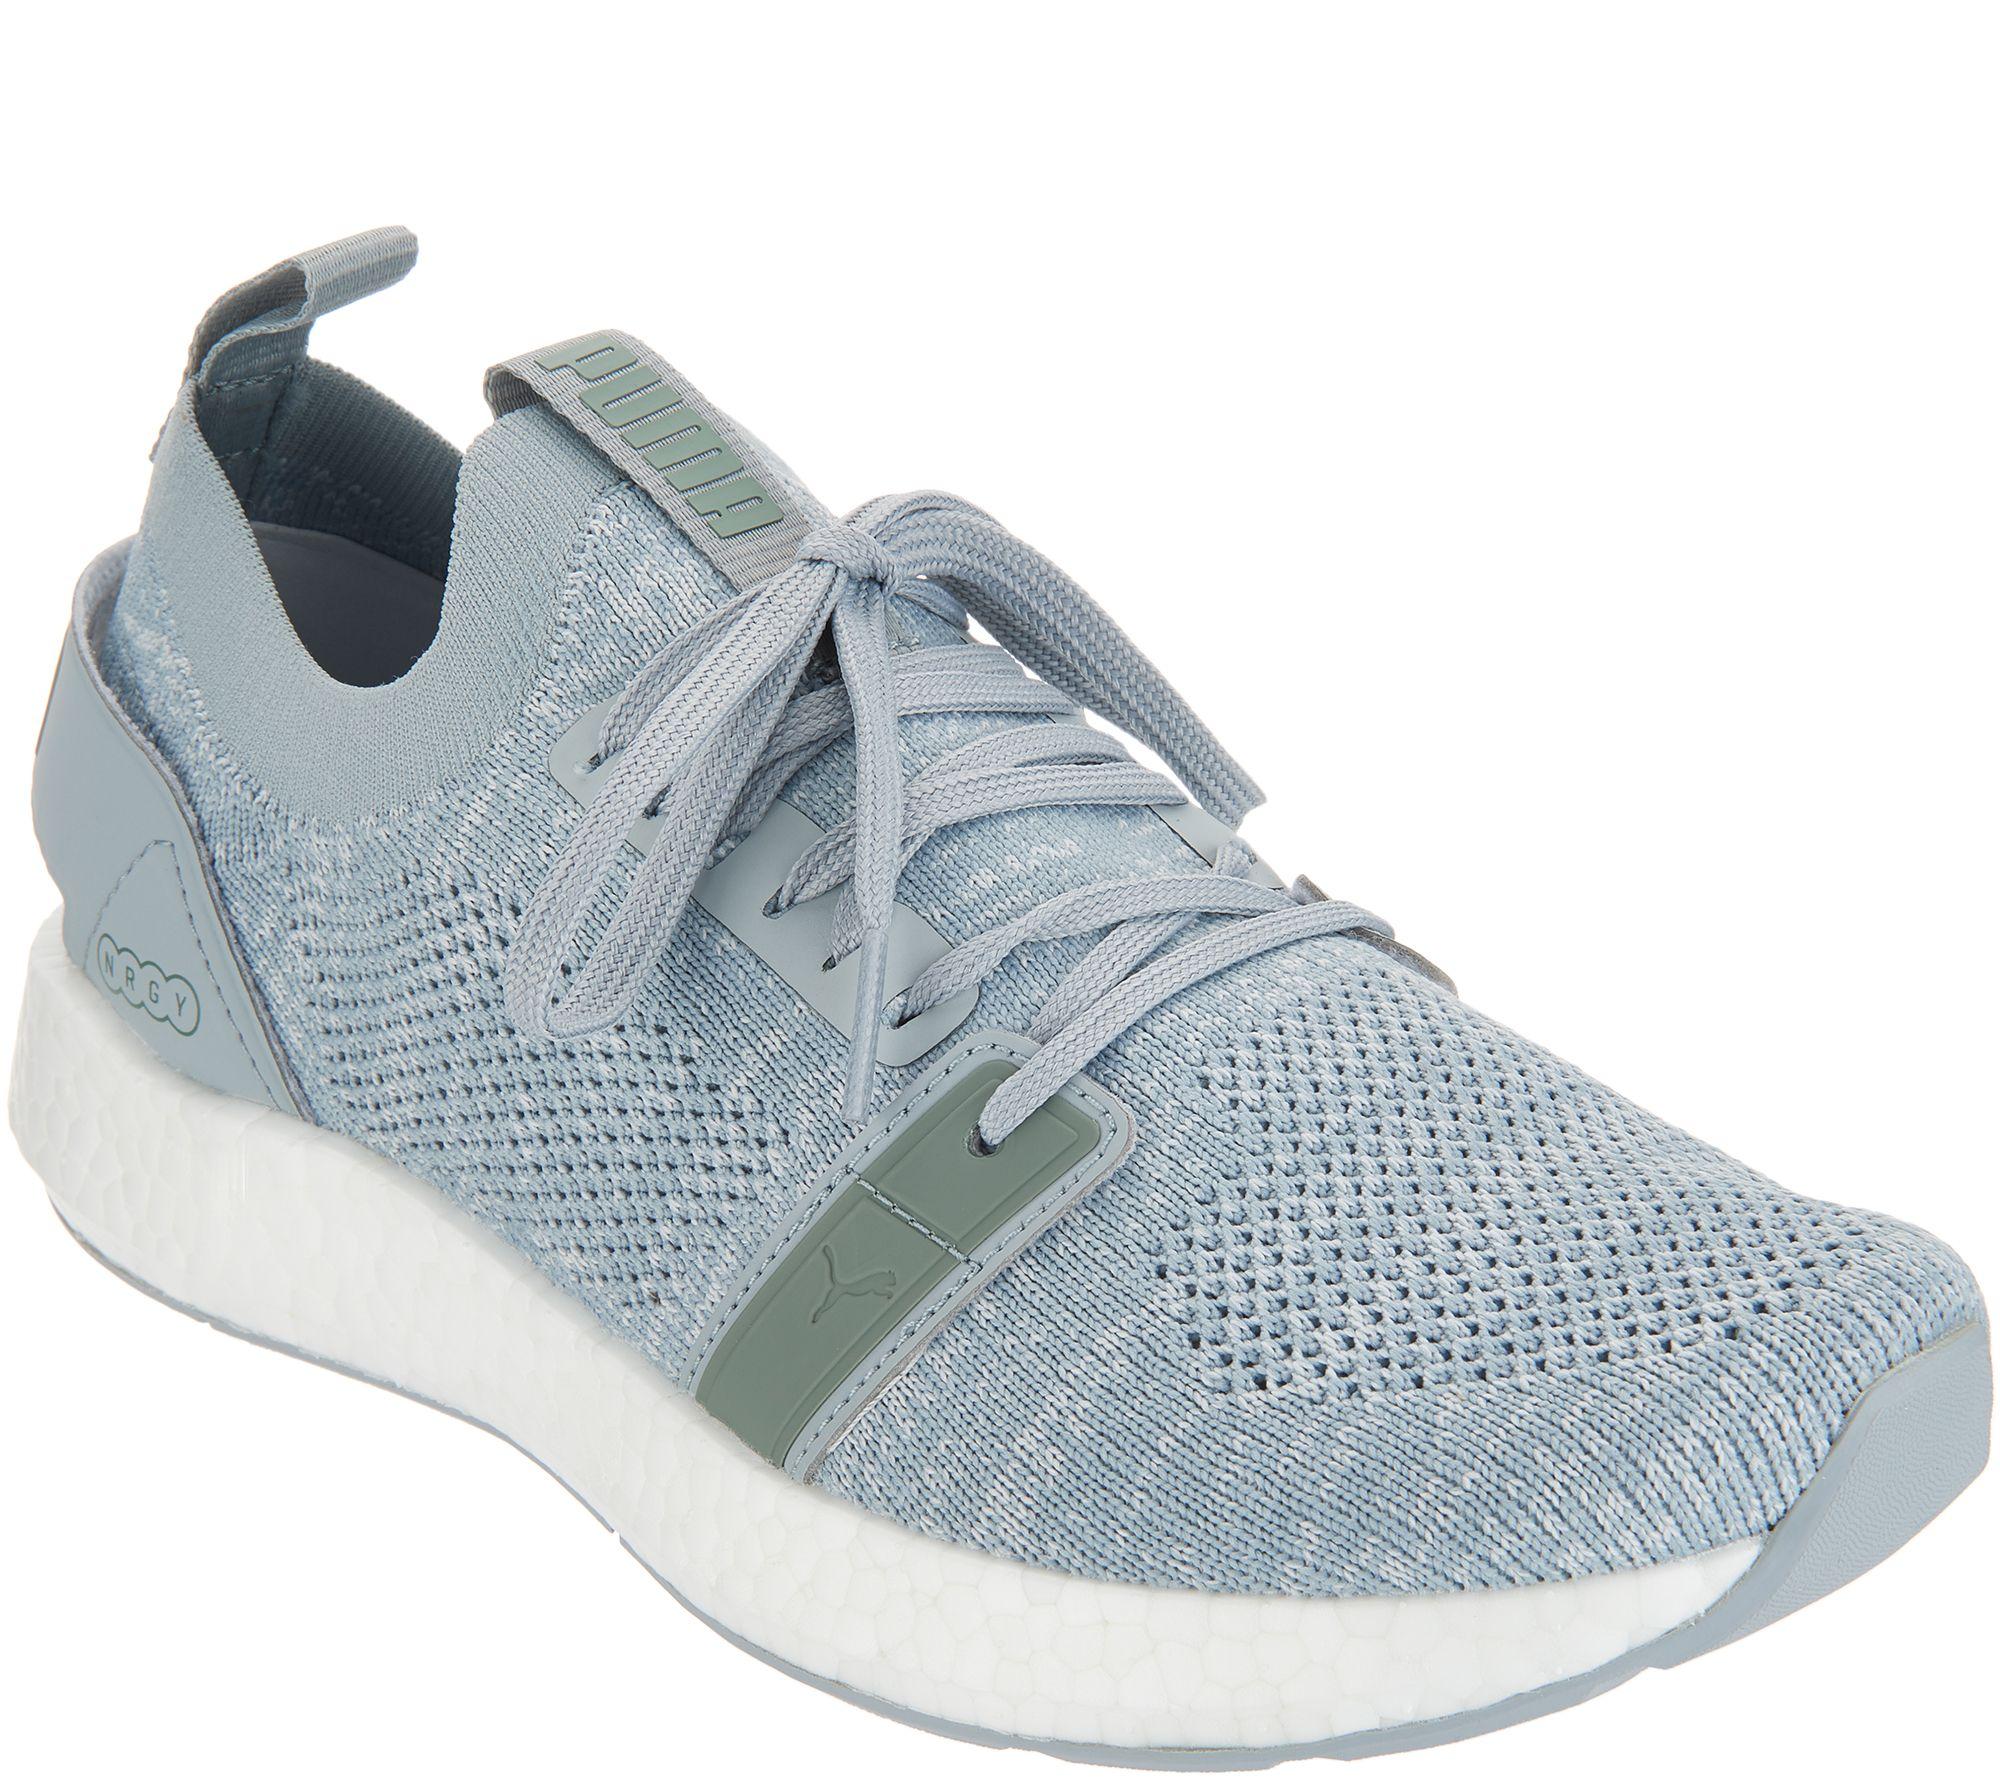 PUMA Knit Lace-Up Sneakers - NRGY Neko Engineer Knit - Page 1 — QVC.com 0cee17a02